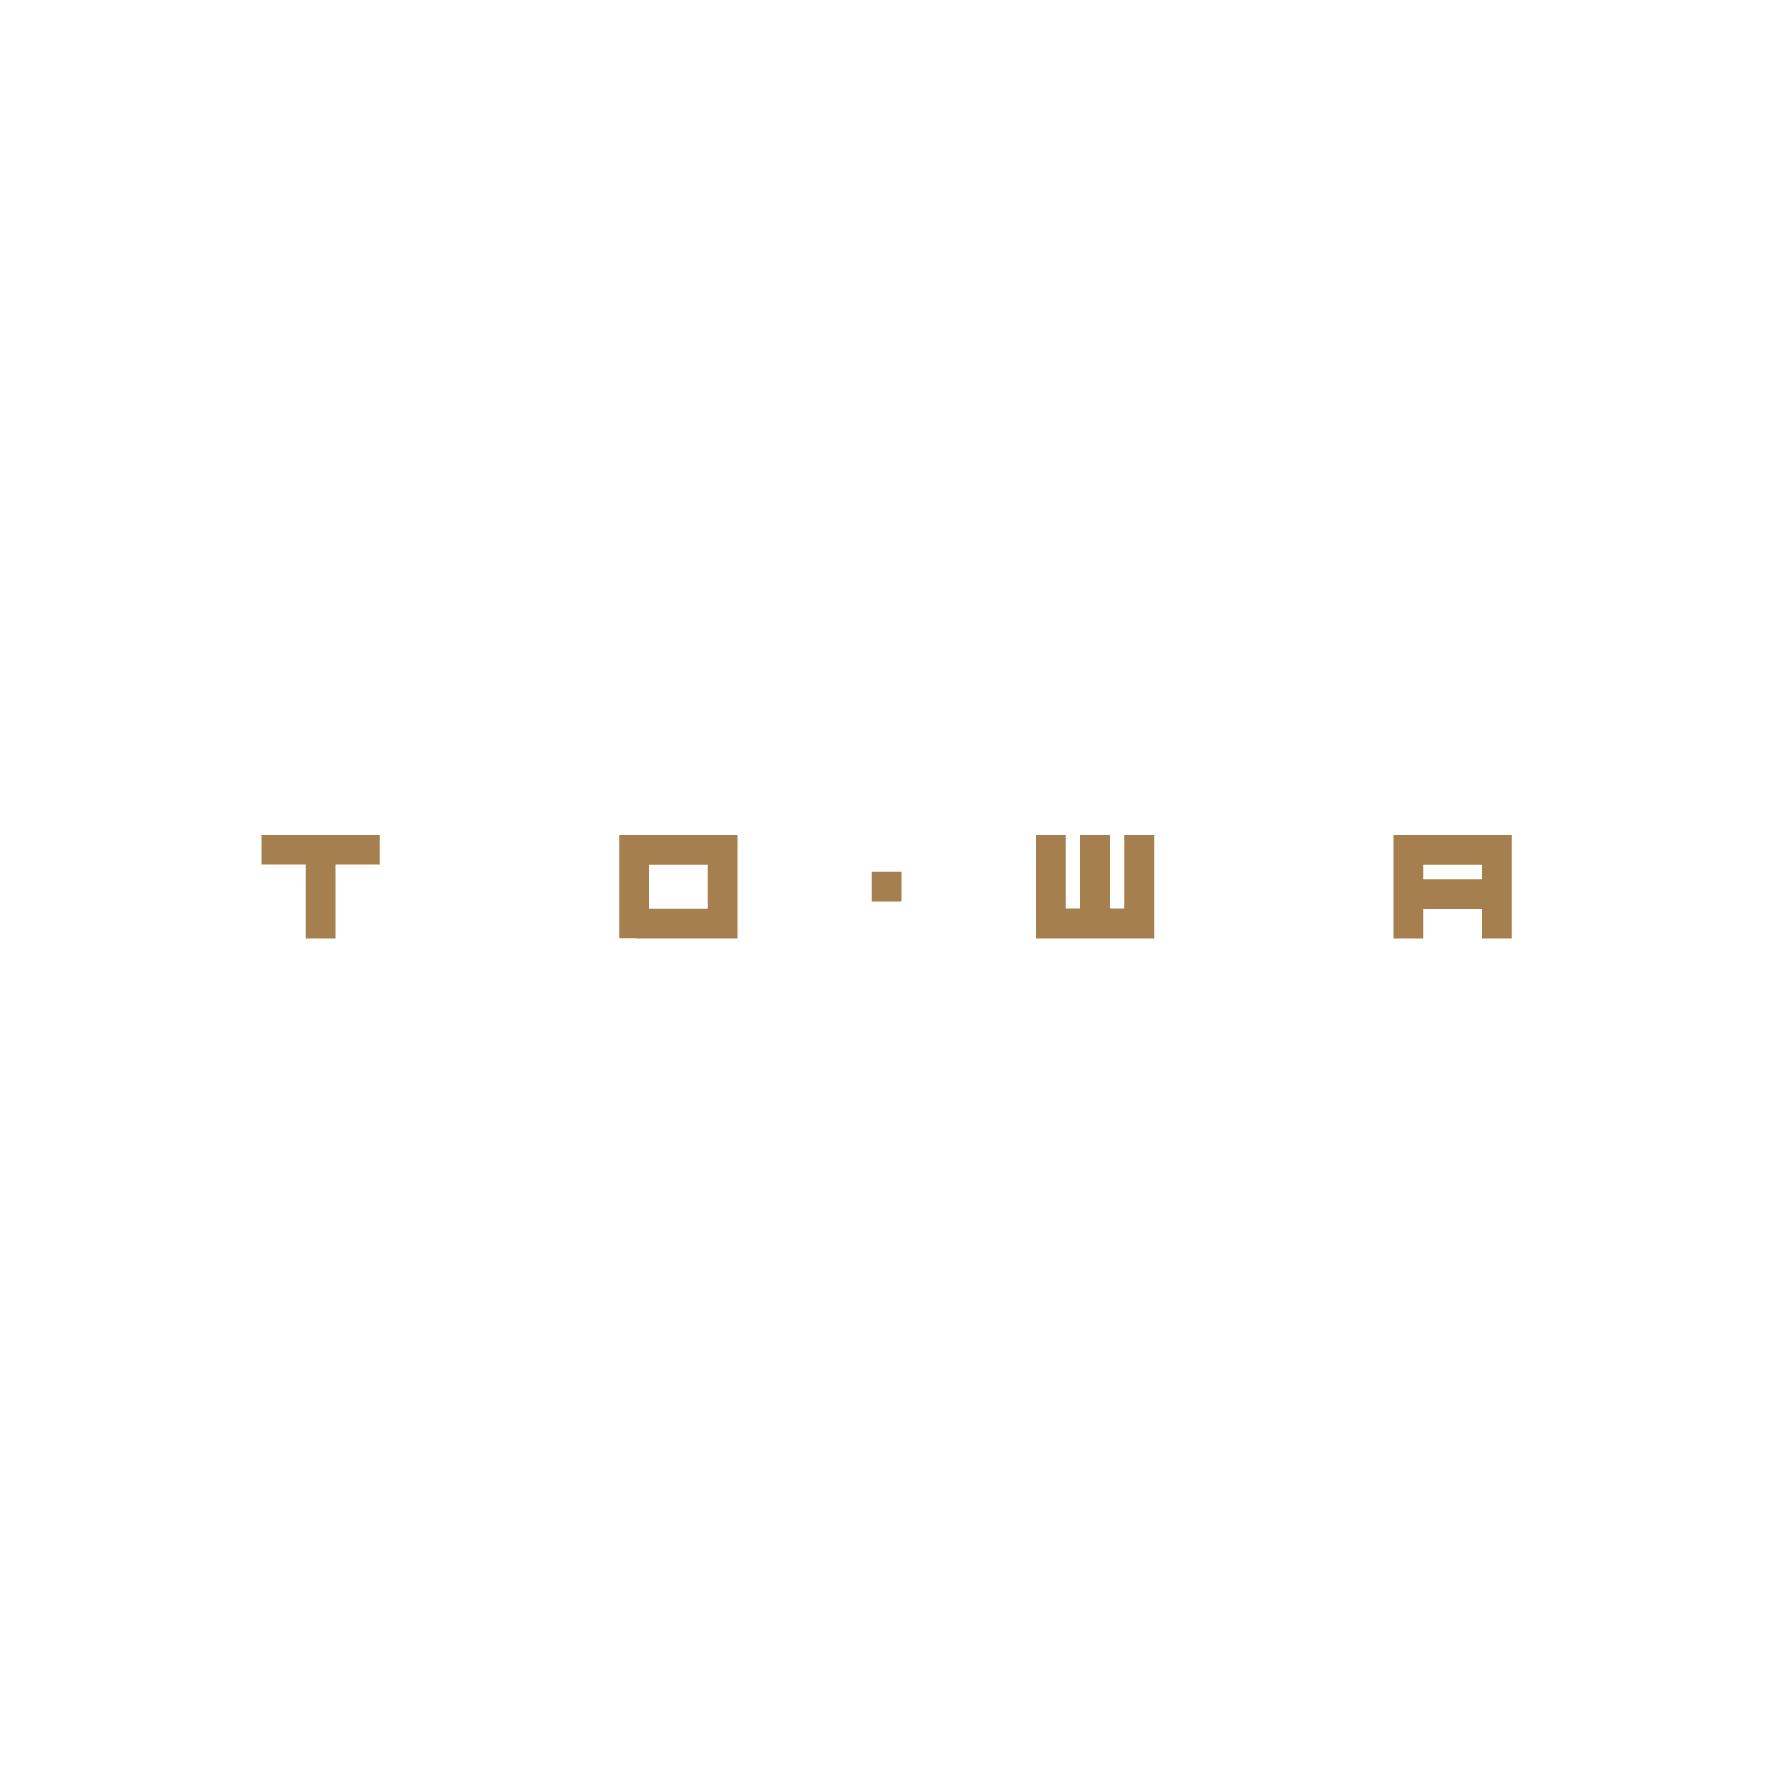 TOWA - the digital growth company